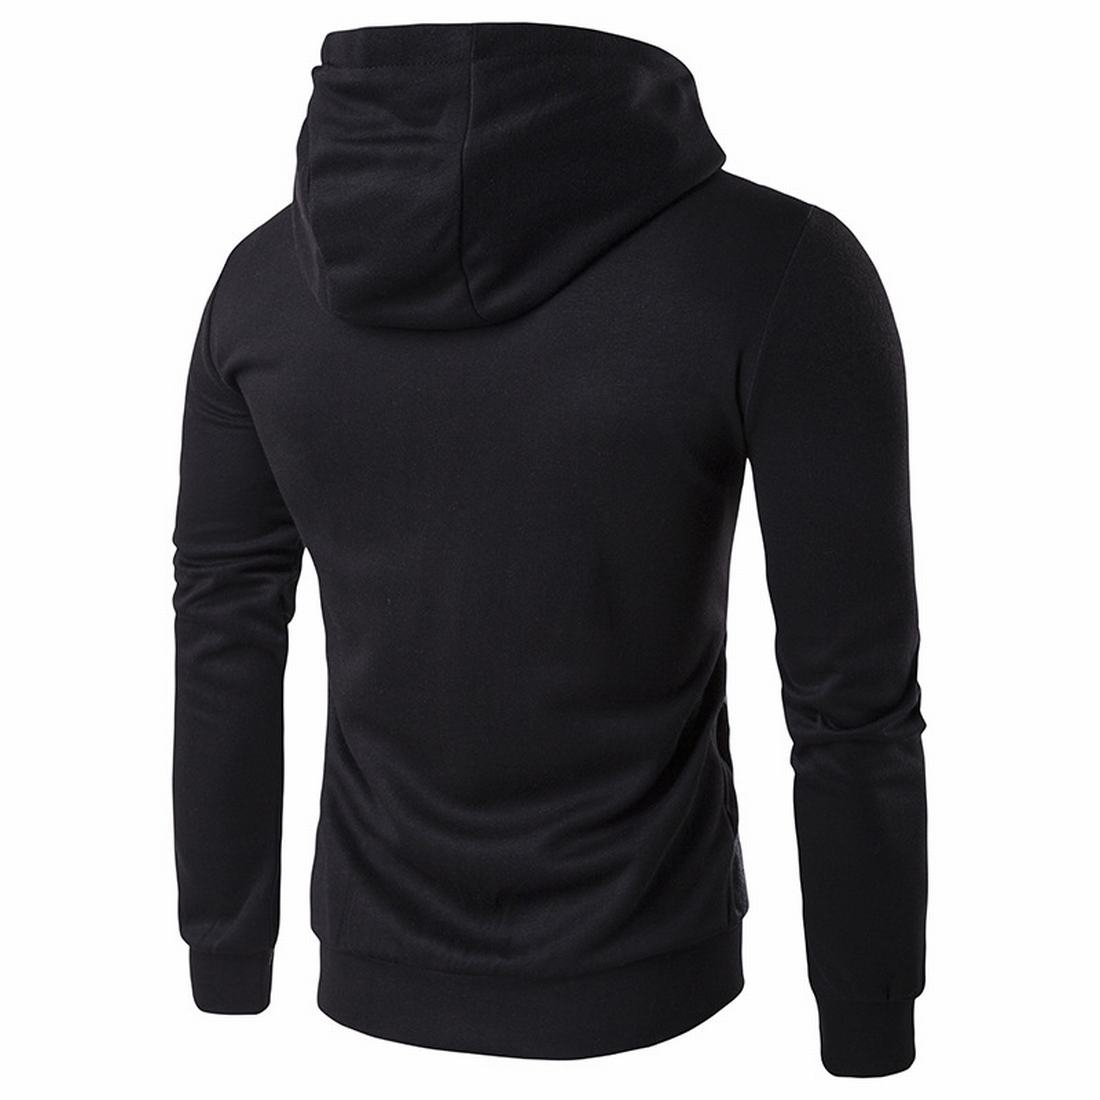 Honey GD Mens Zipper Hooded Cozy Stylish Long Sleeve Sweatshirts